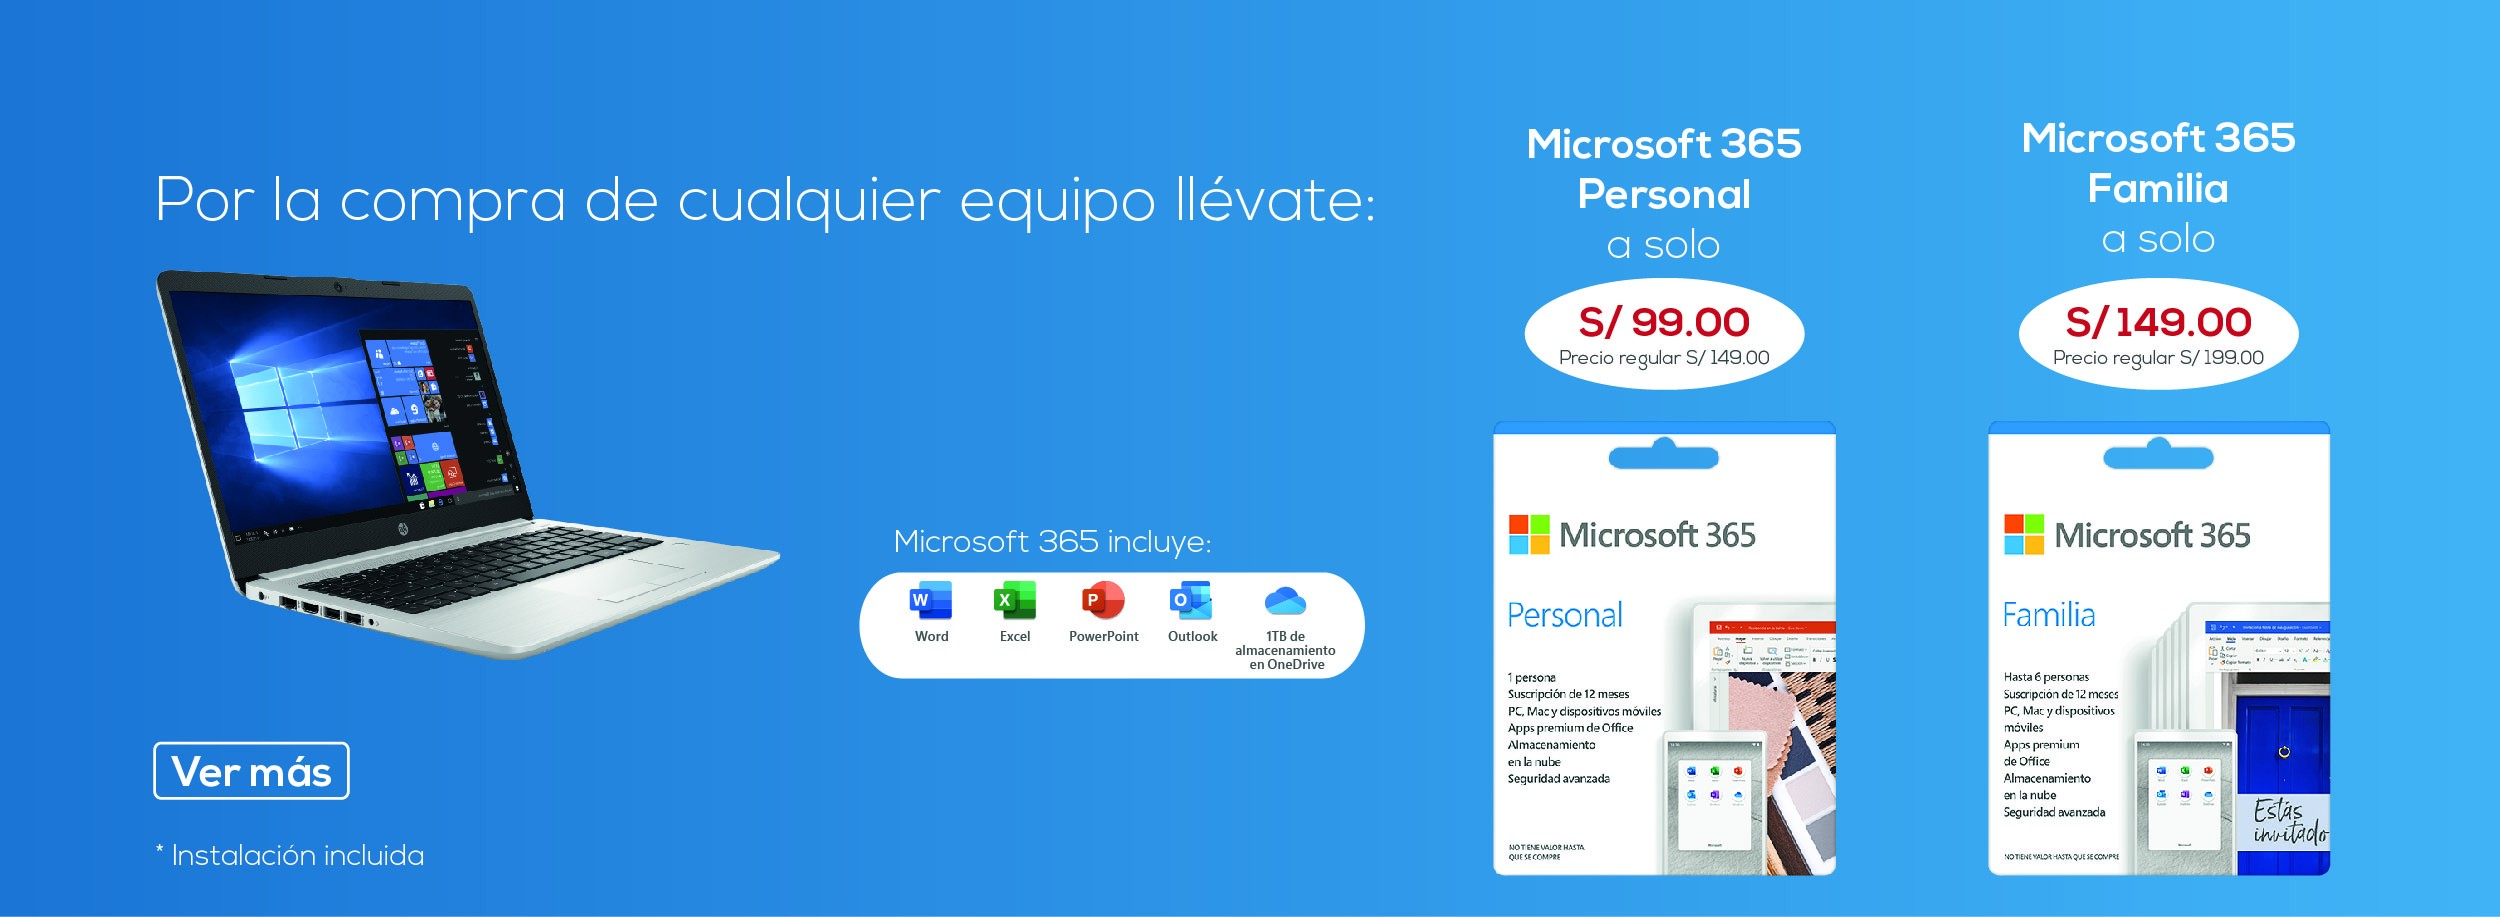 Oferta Microsoft 365